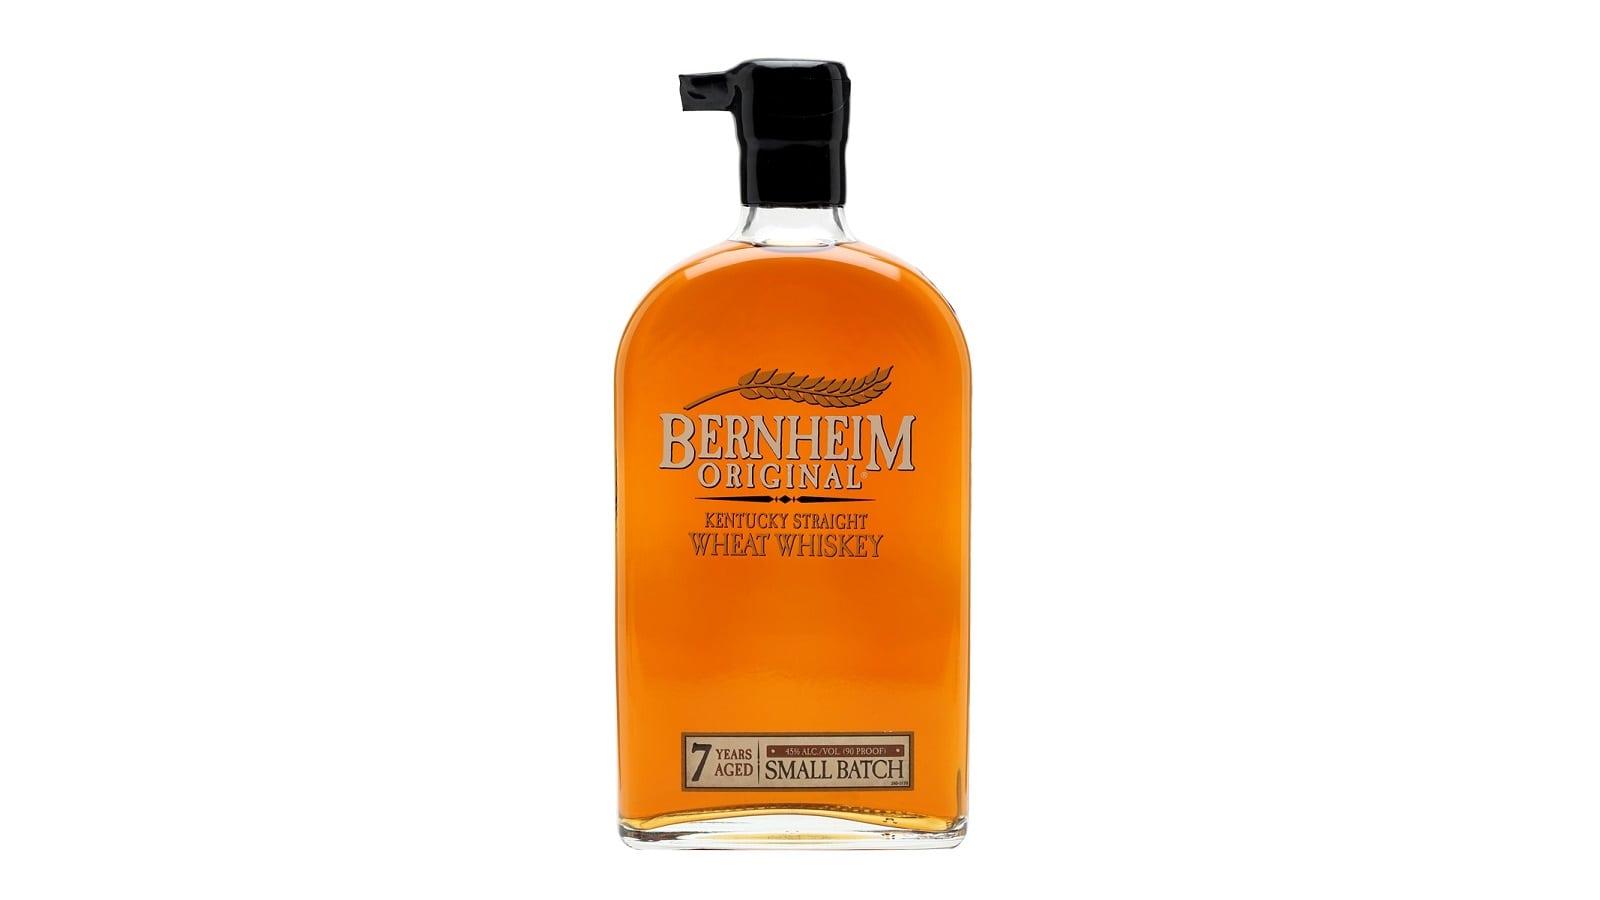 Bernheim Original